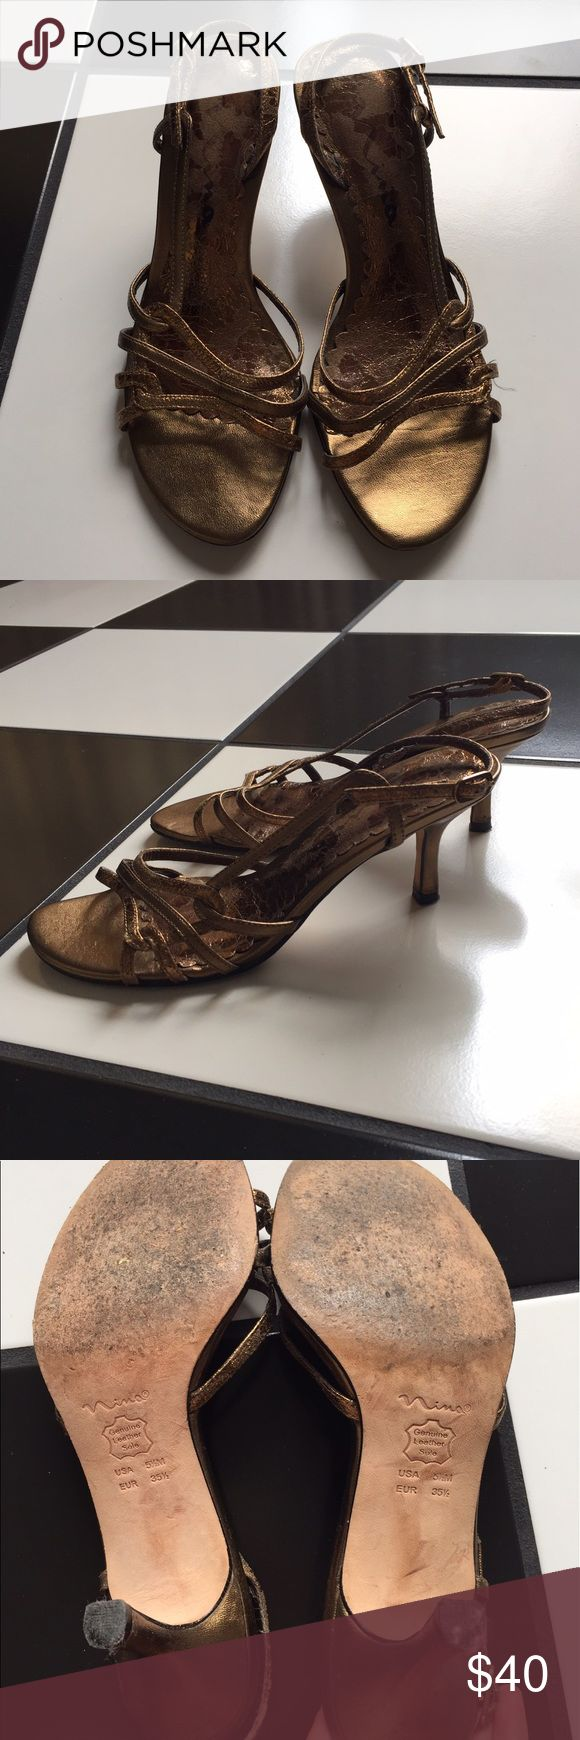 Nina shoes에 관•œ 상위 25개 이상의 Pinterest 아이디어